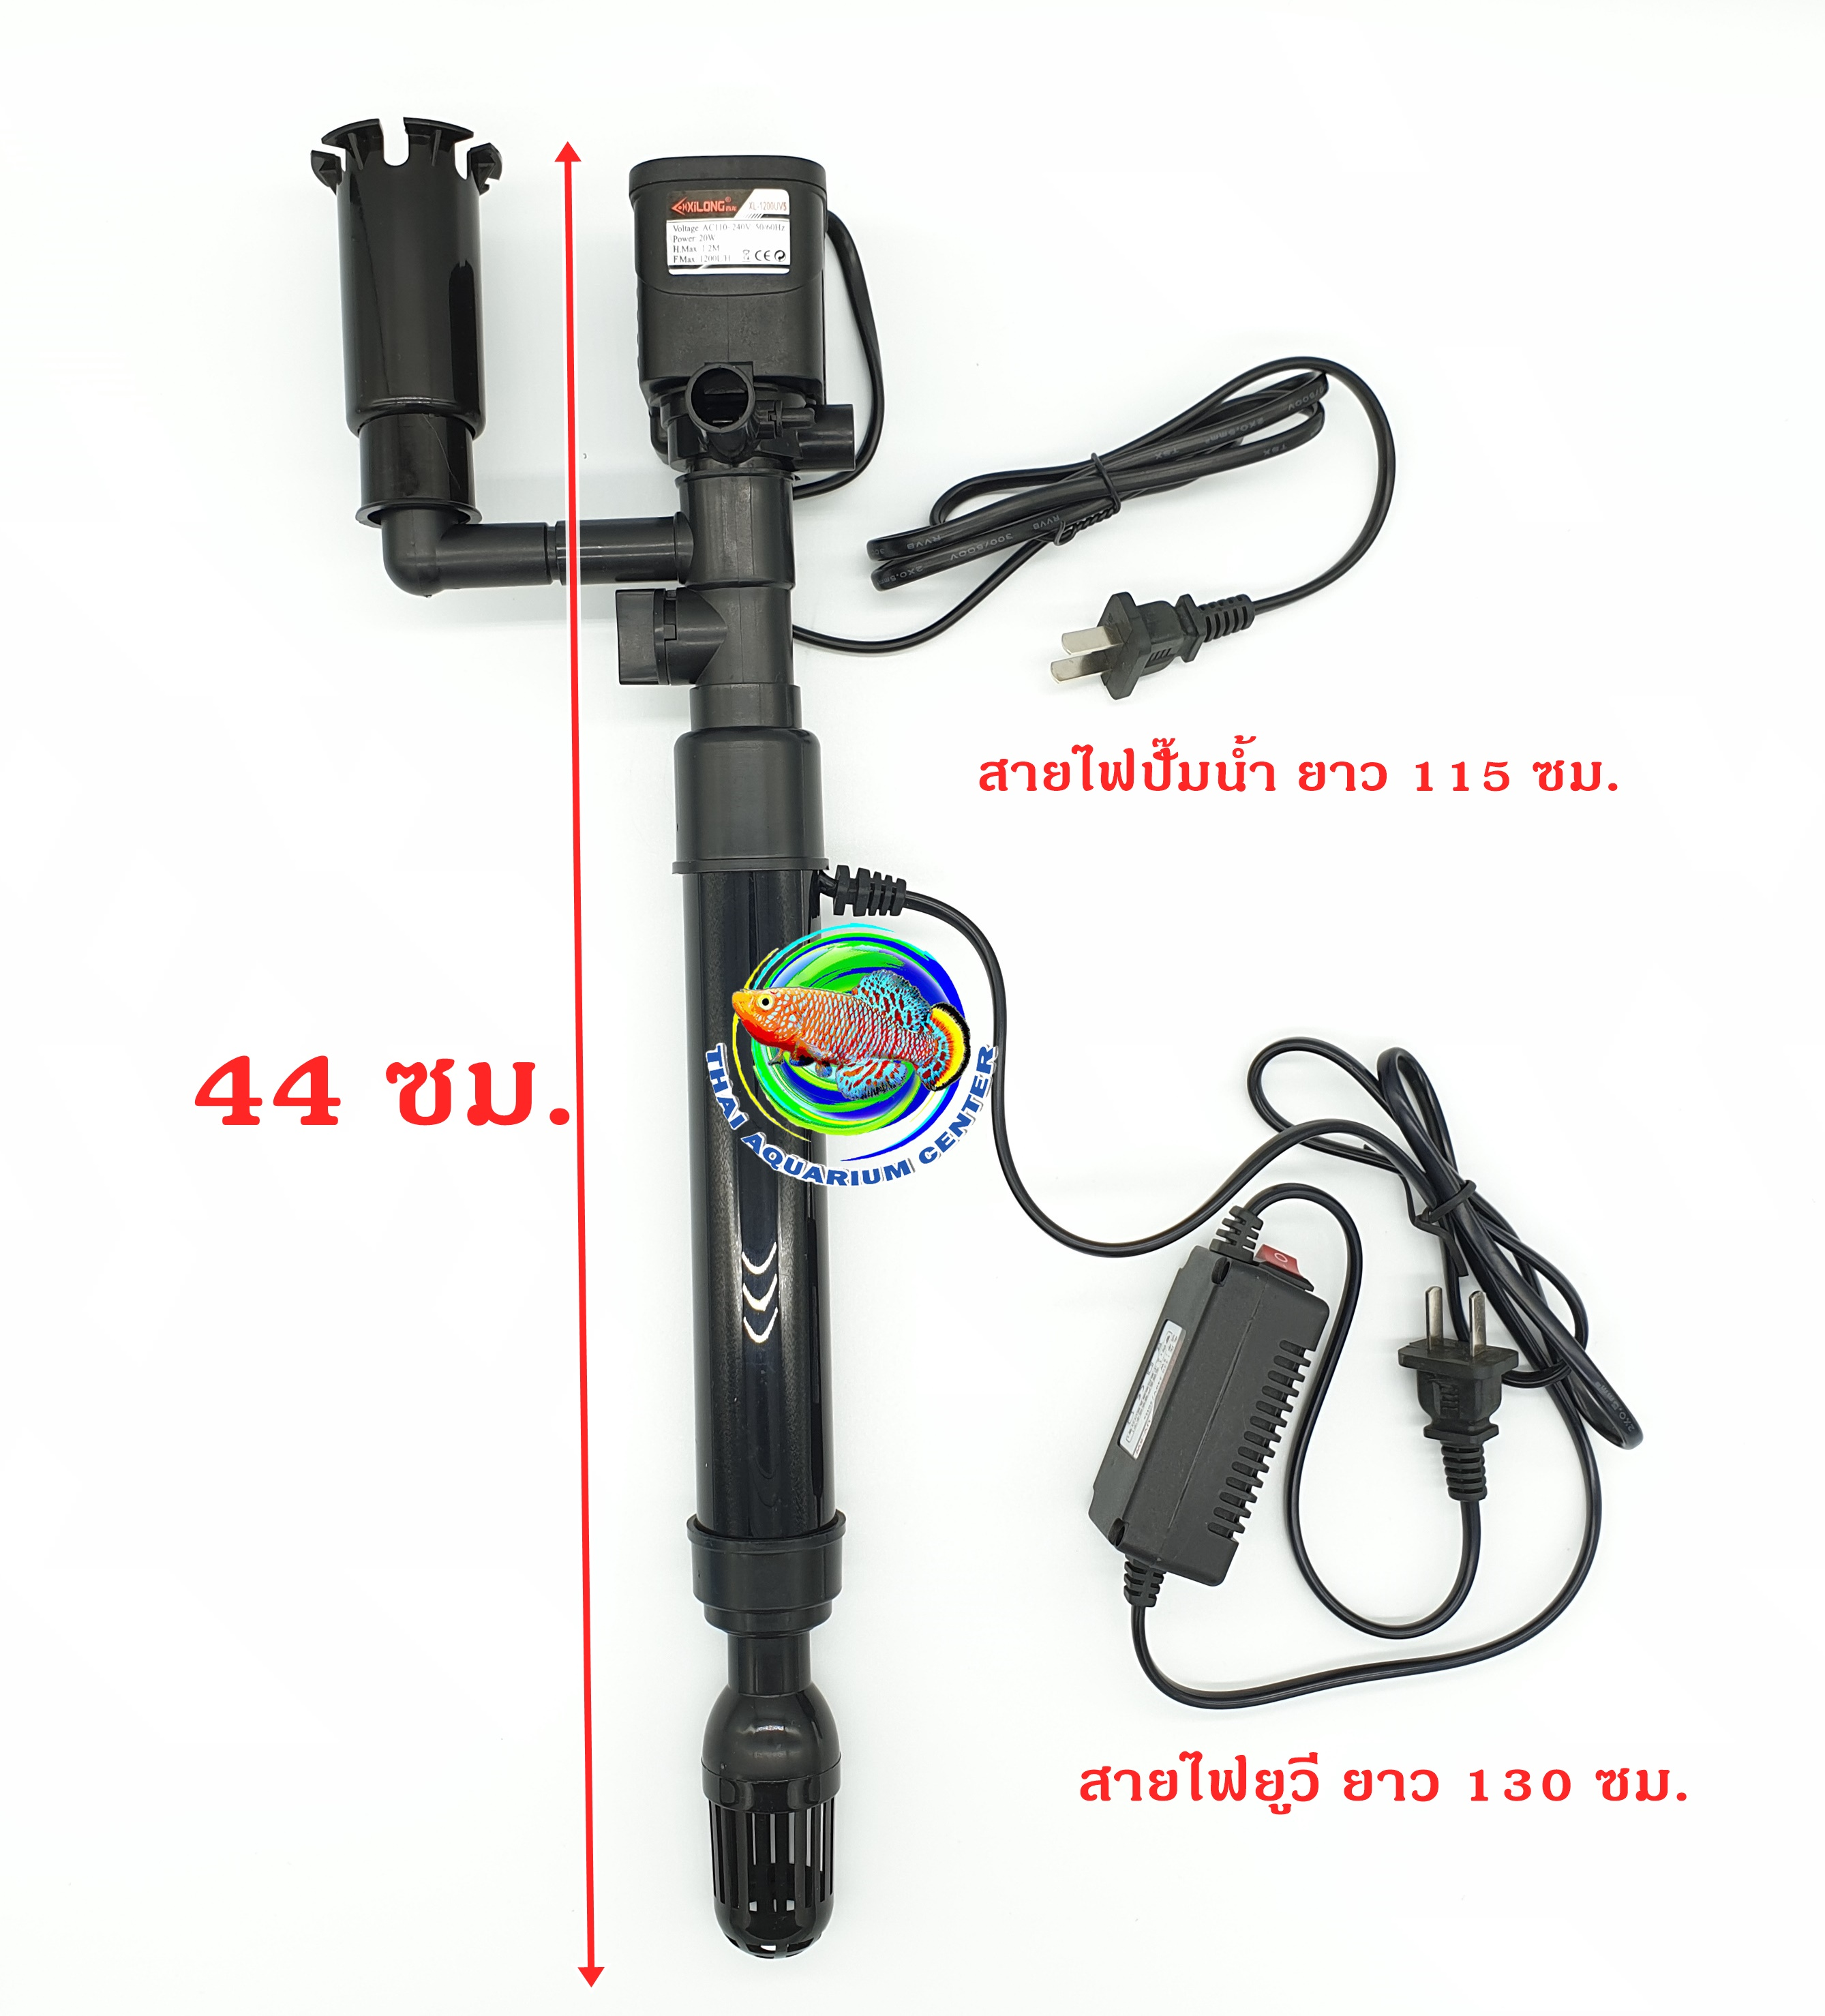 XiLong XL-1200 UV11 ปั๊มน้ำ ปัั๊มน้ำพุ ปั๊มแช่ พร้อมหลอด UV 11 วัตต์